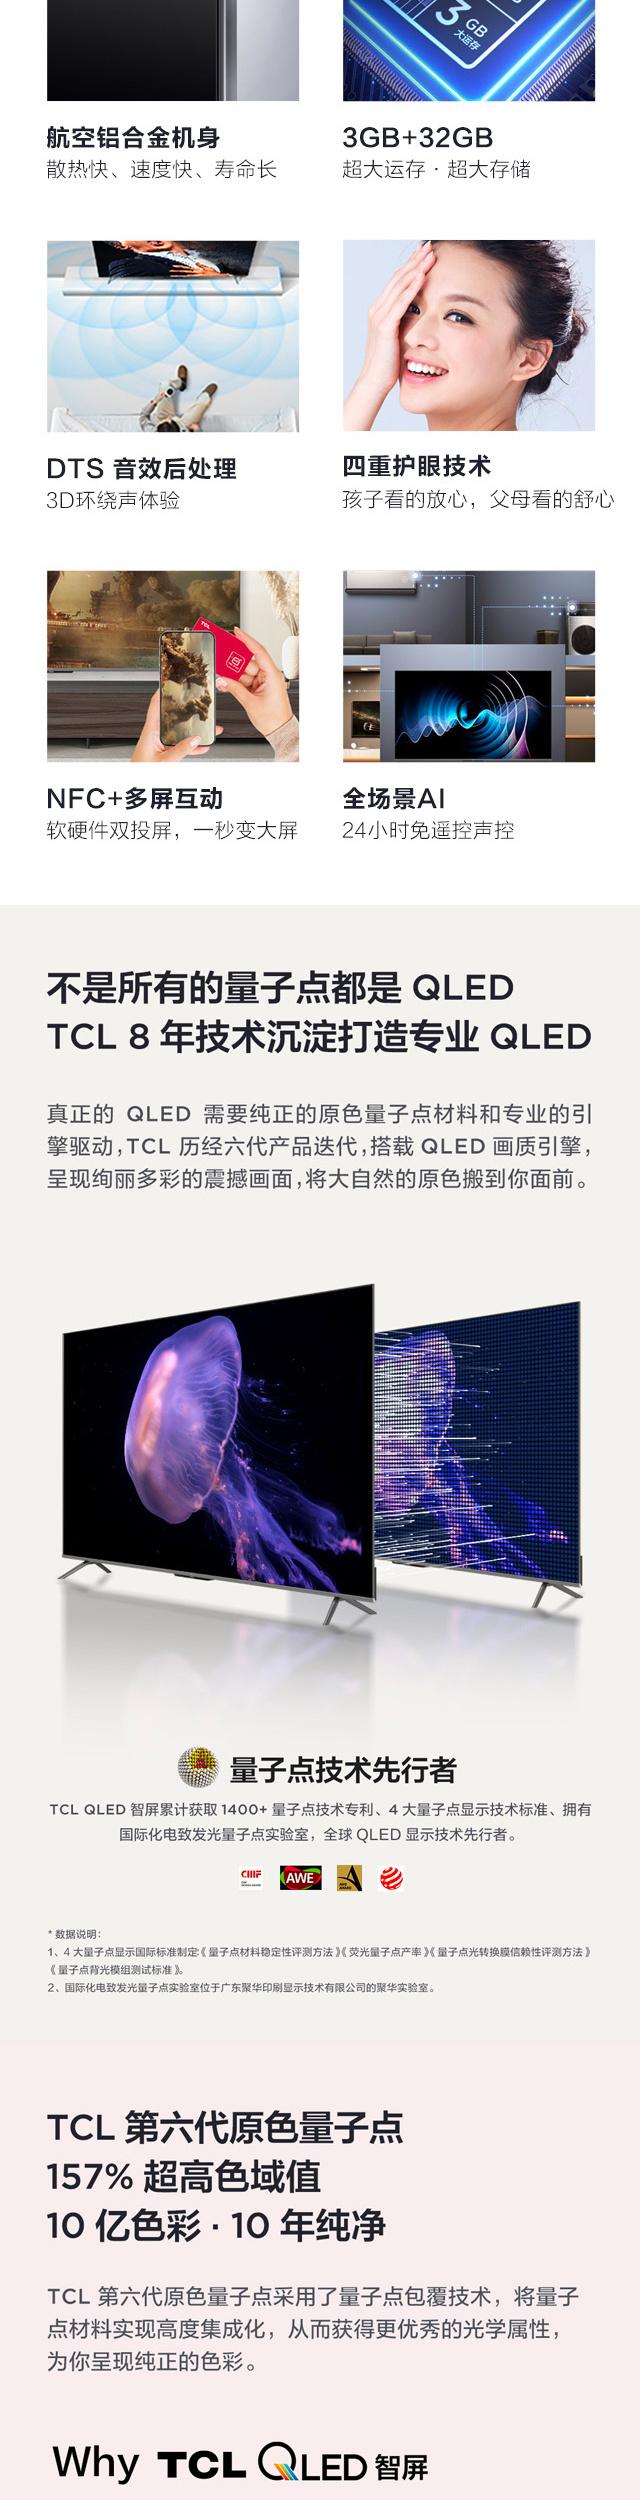 TCLQLEDQ8E